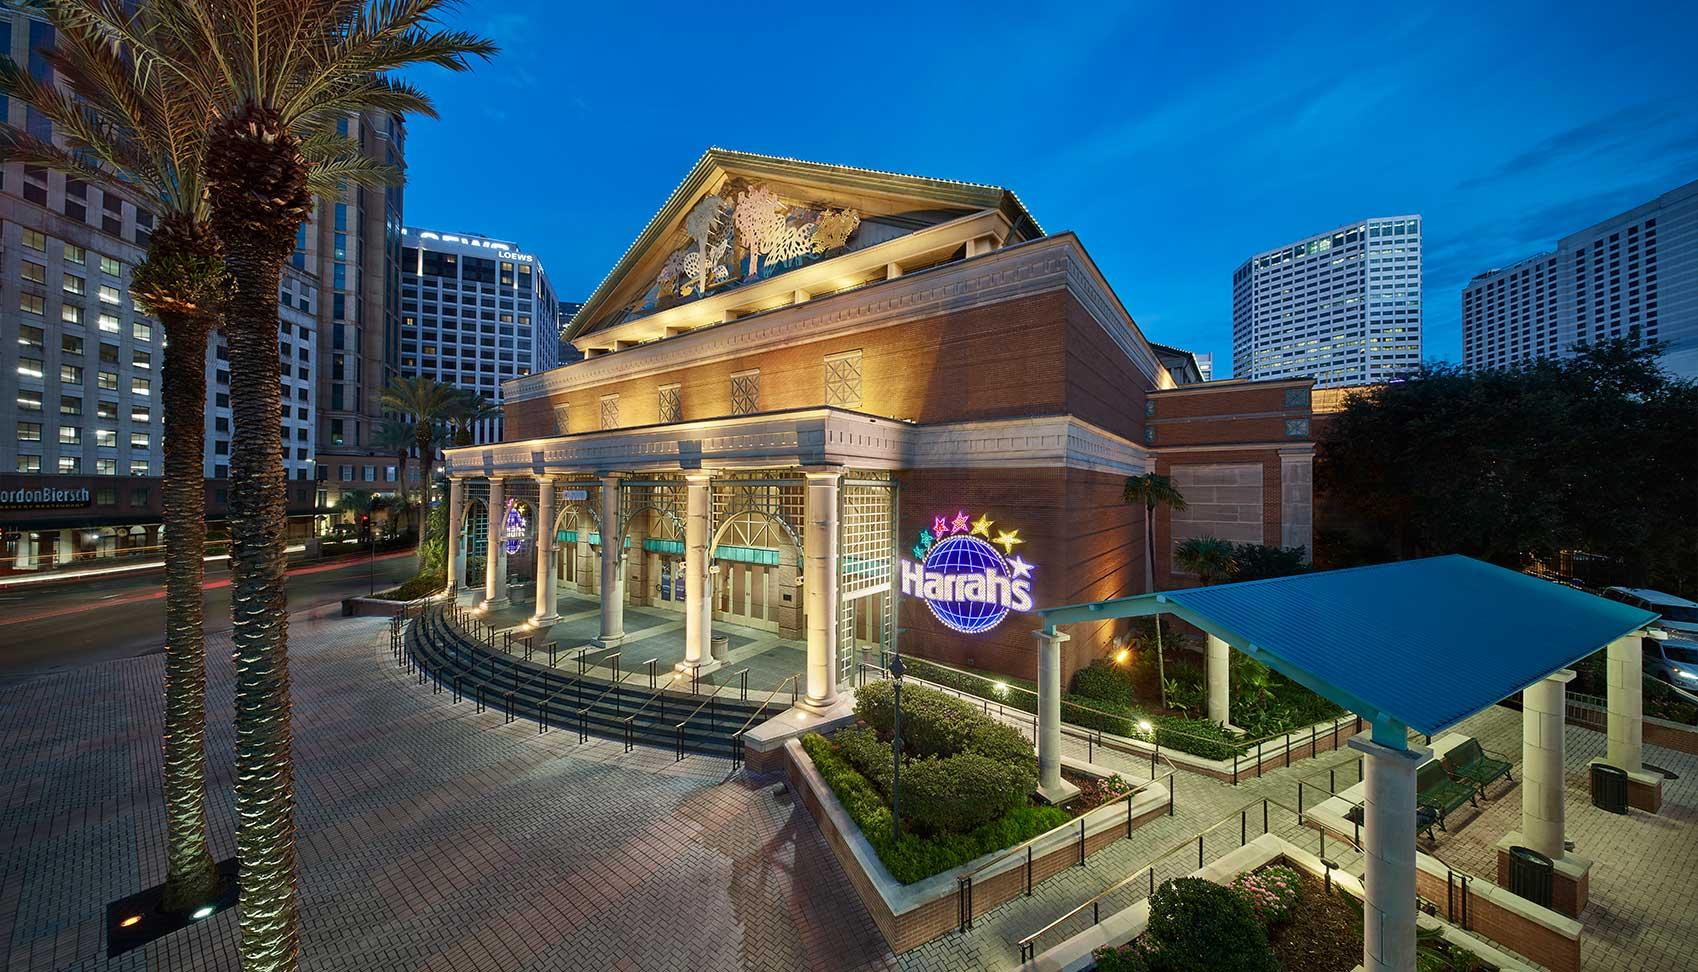 Caesars Entertainment's Harrah's New Orleans. Credit Caesars Entertainment.